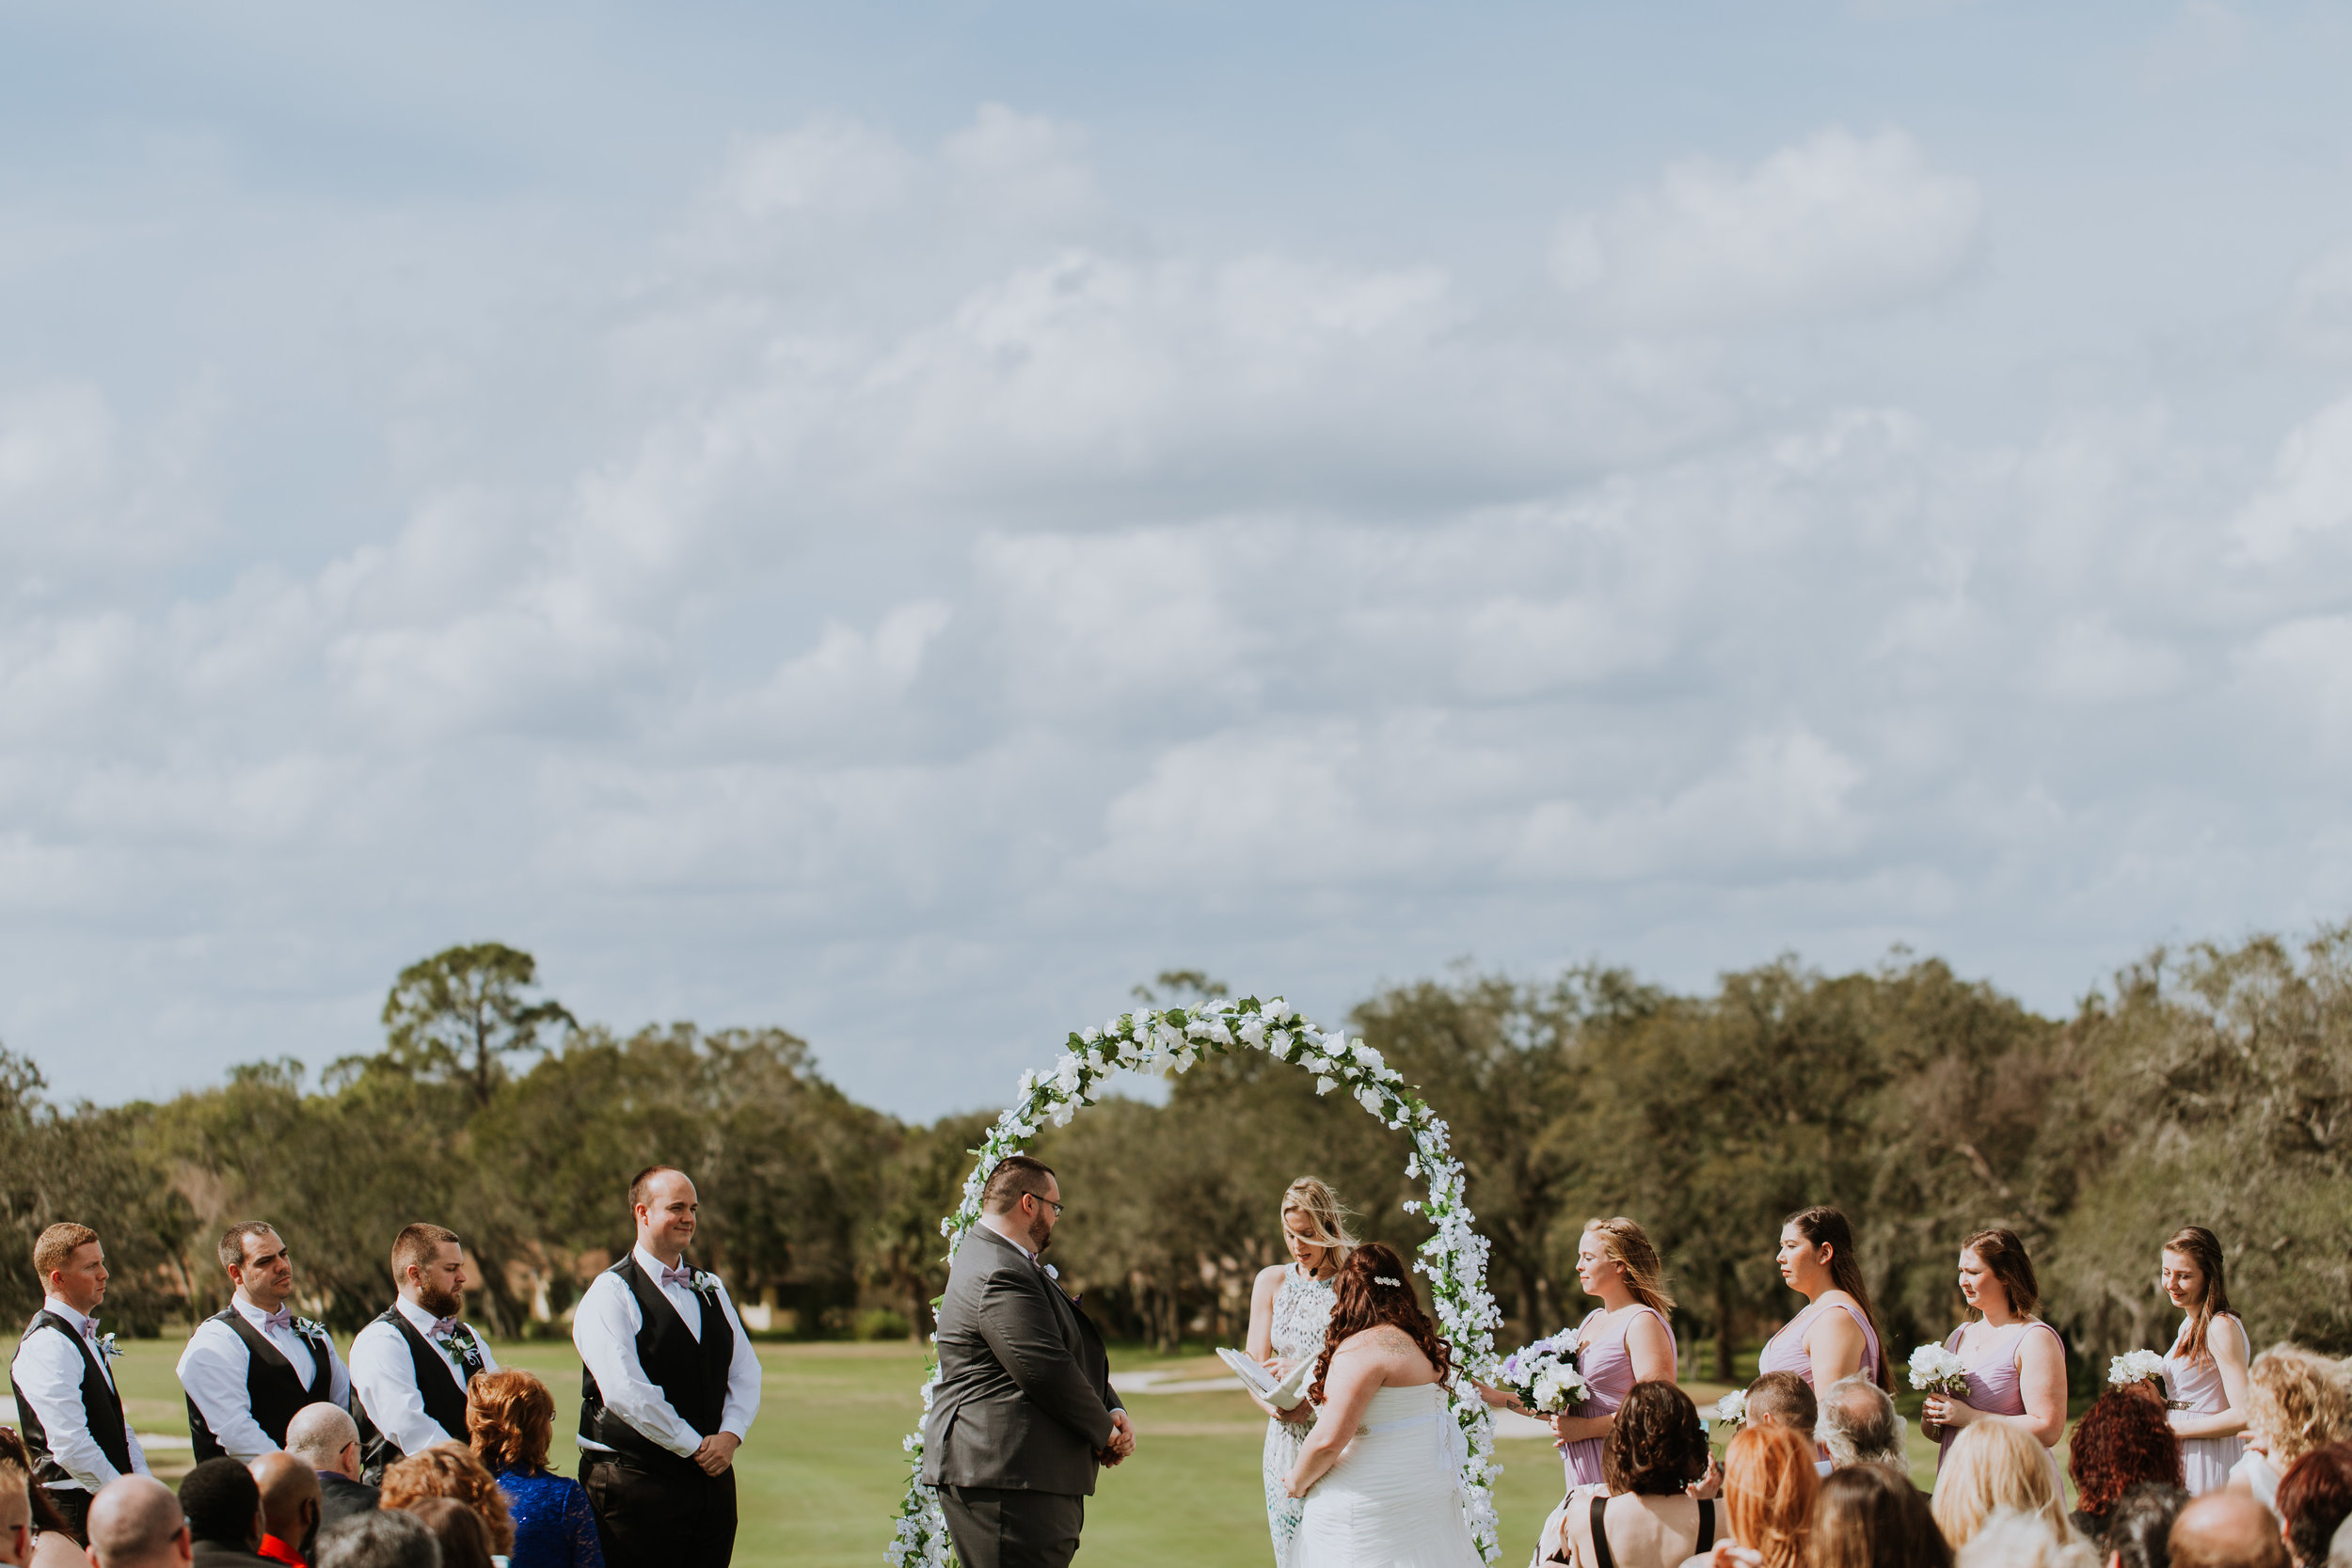 appolloni_new smyrna_wedding-187.jpg